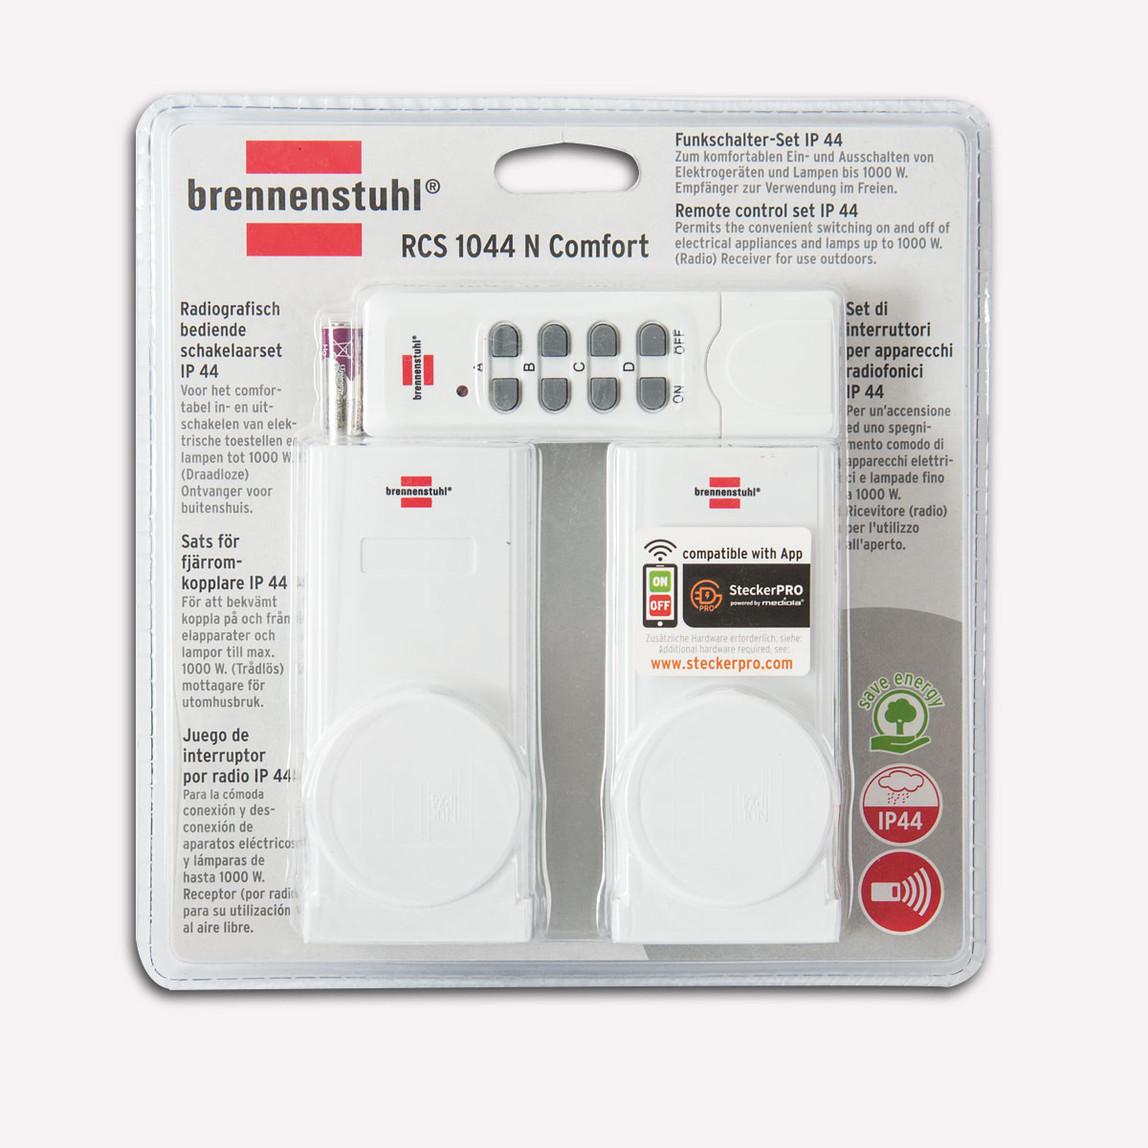 Brennenstuhl RCS1044 N Comfort 2'li Uzaktan Kumandalı Priz Set